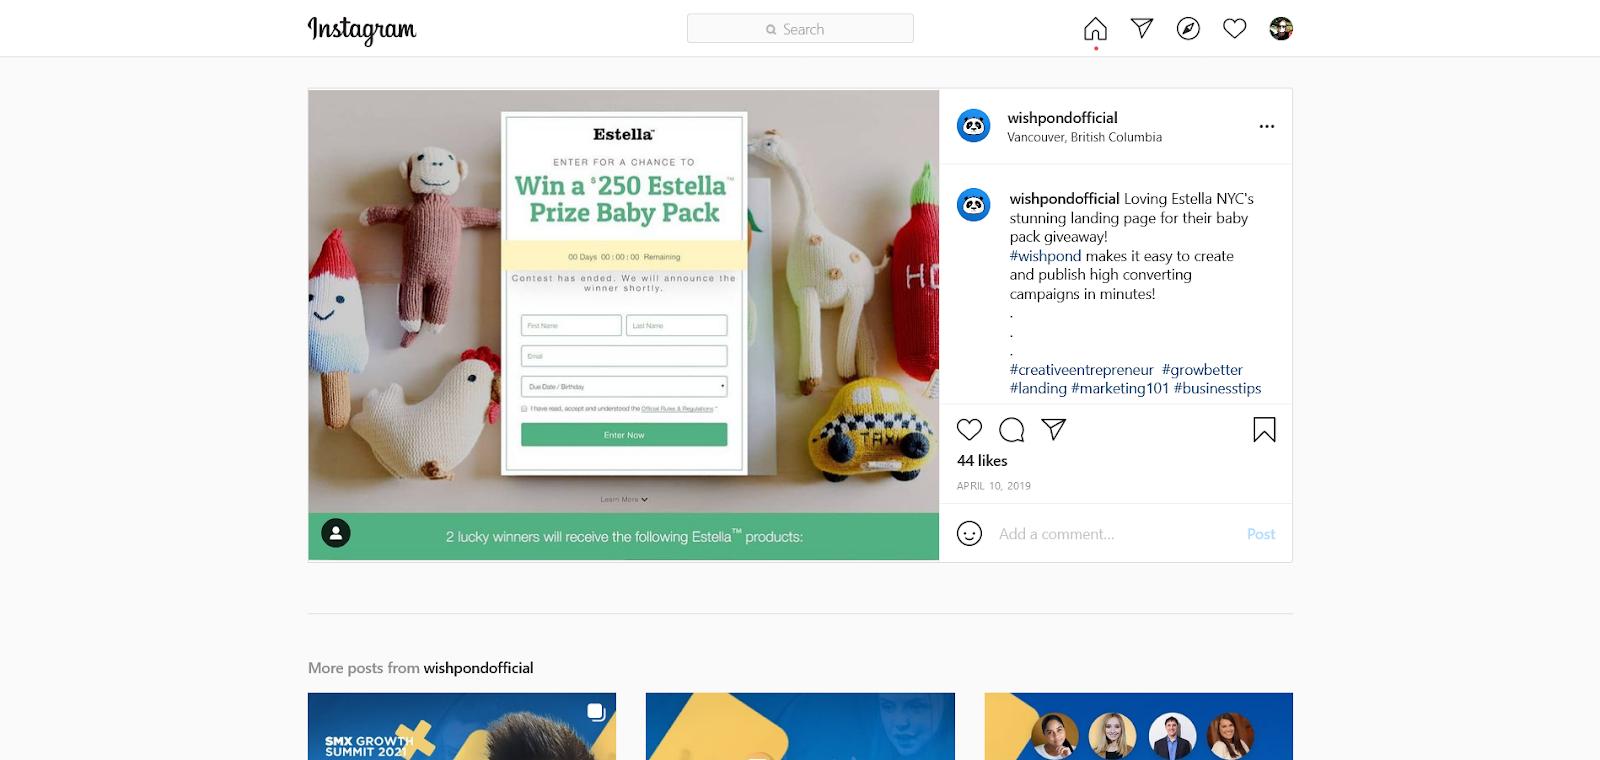 wishpond instagram giveaway